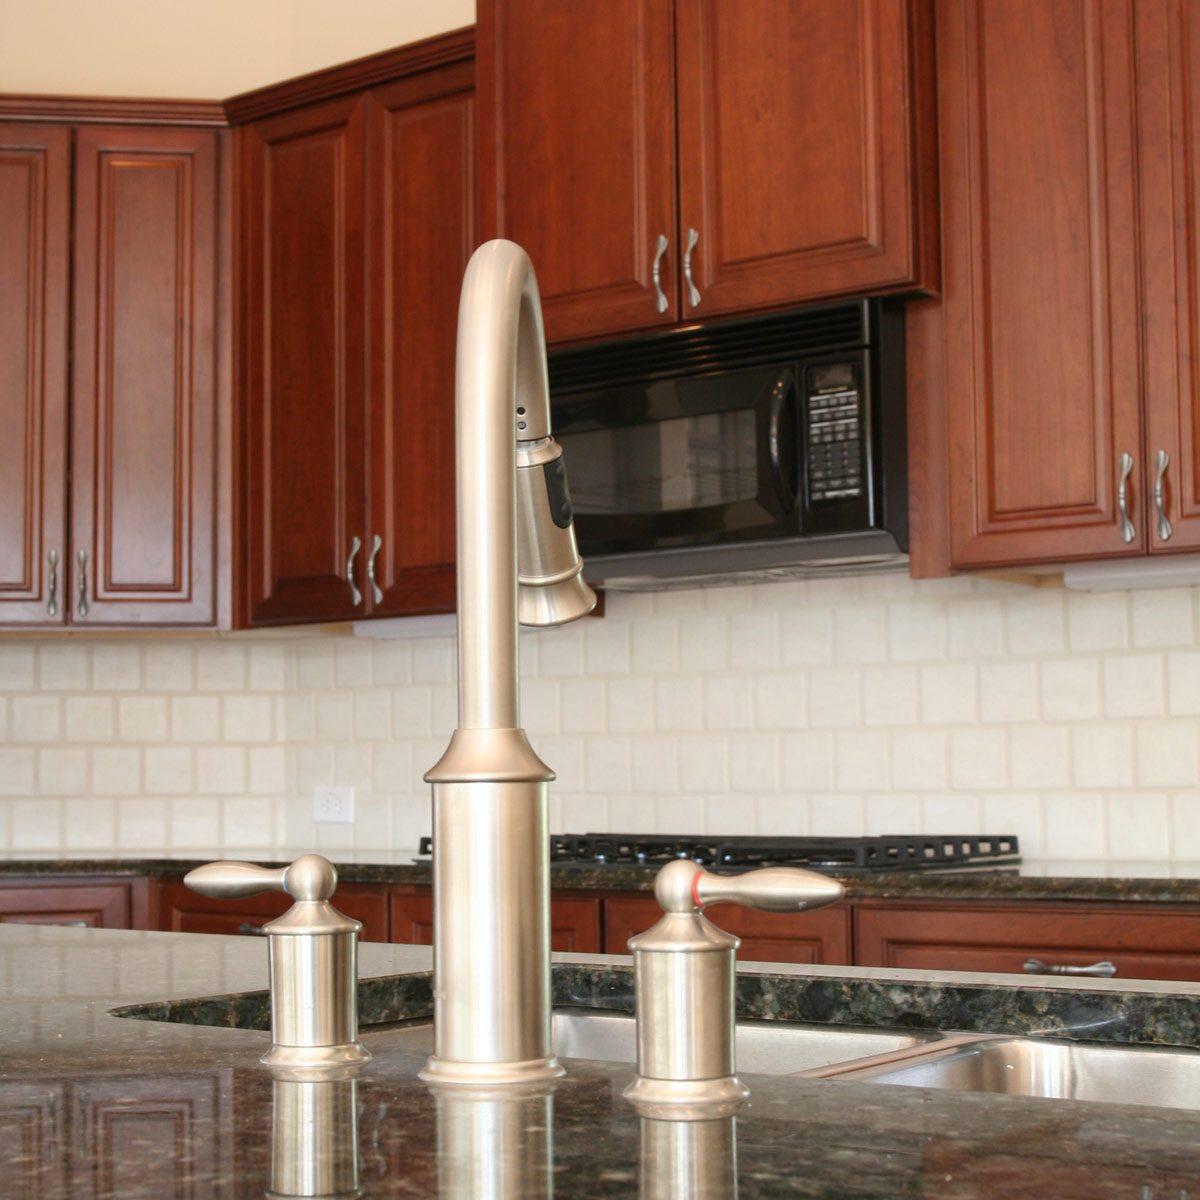 White-tile-kitchen-backsplash-set-among-dark-cabinets-and-black-granite-countertop